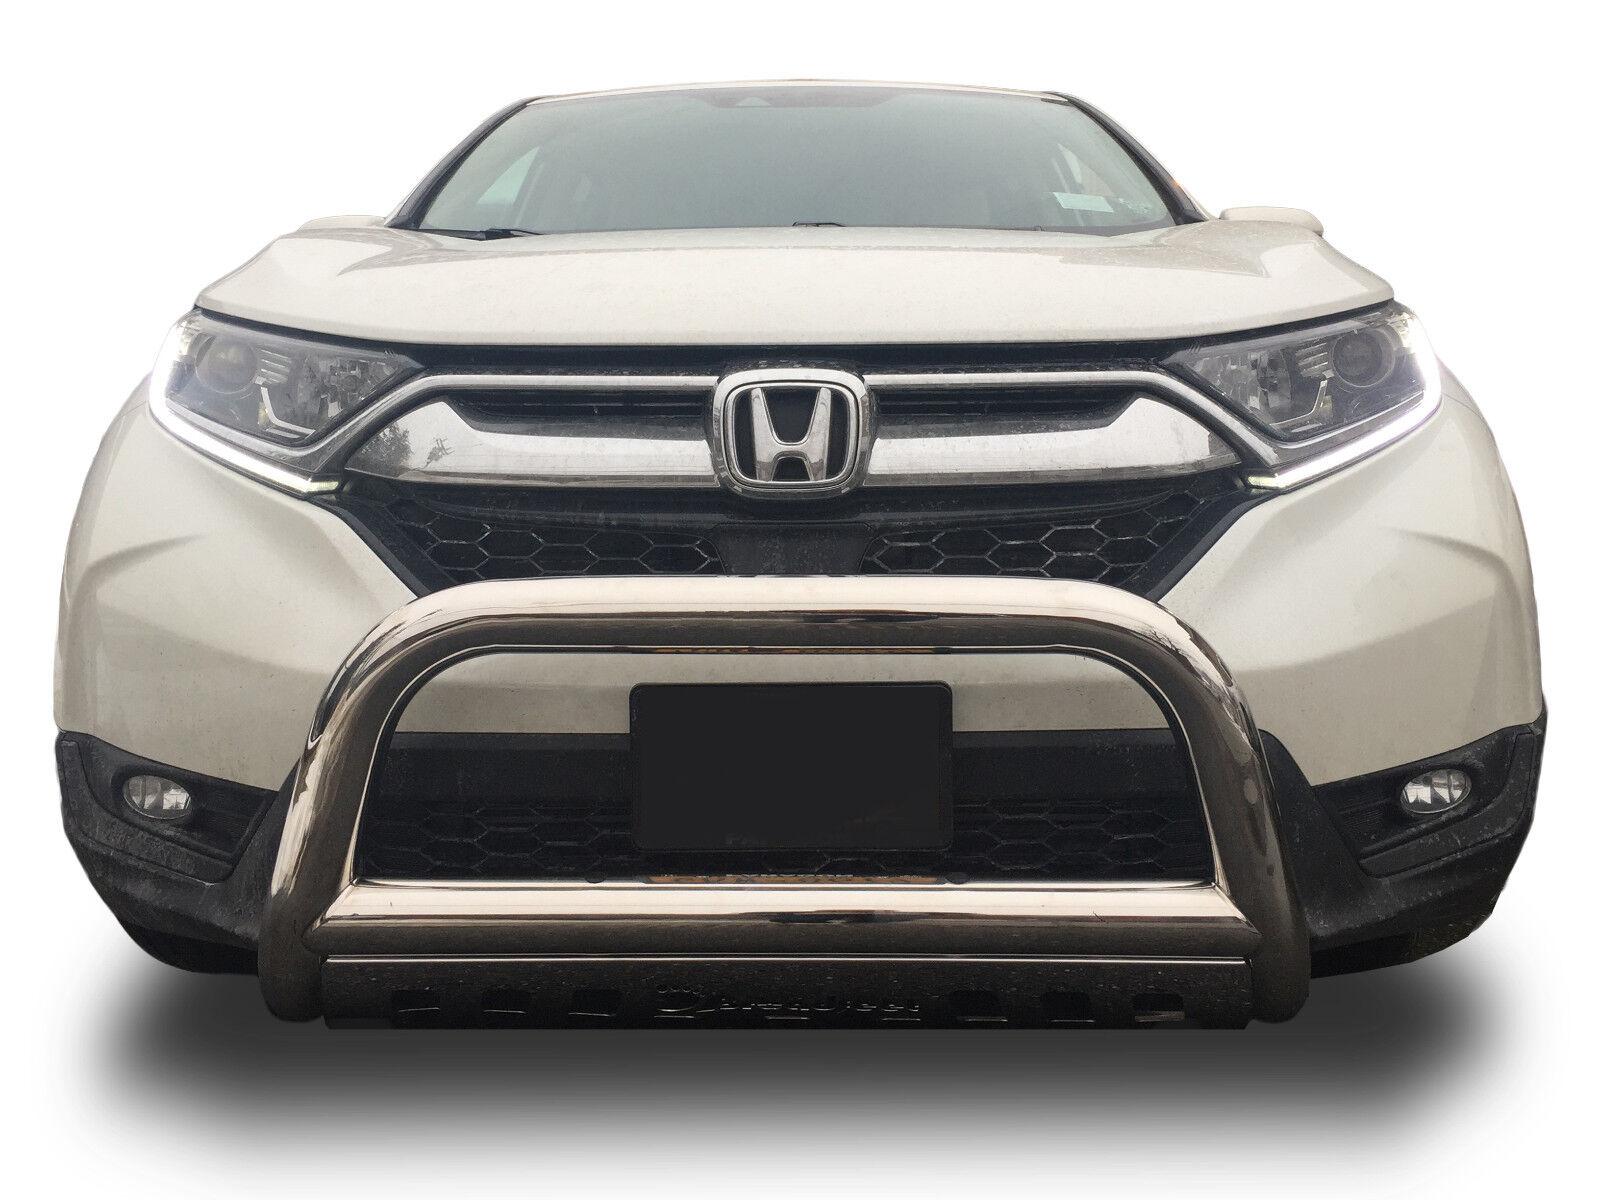 Broadfeet Bull Bar Front Bumper Guard Protector For Honda CR-V 2012-2016 SST